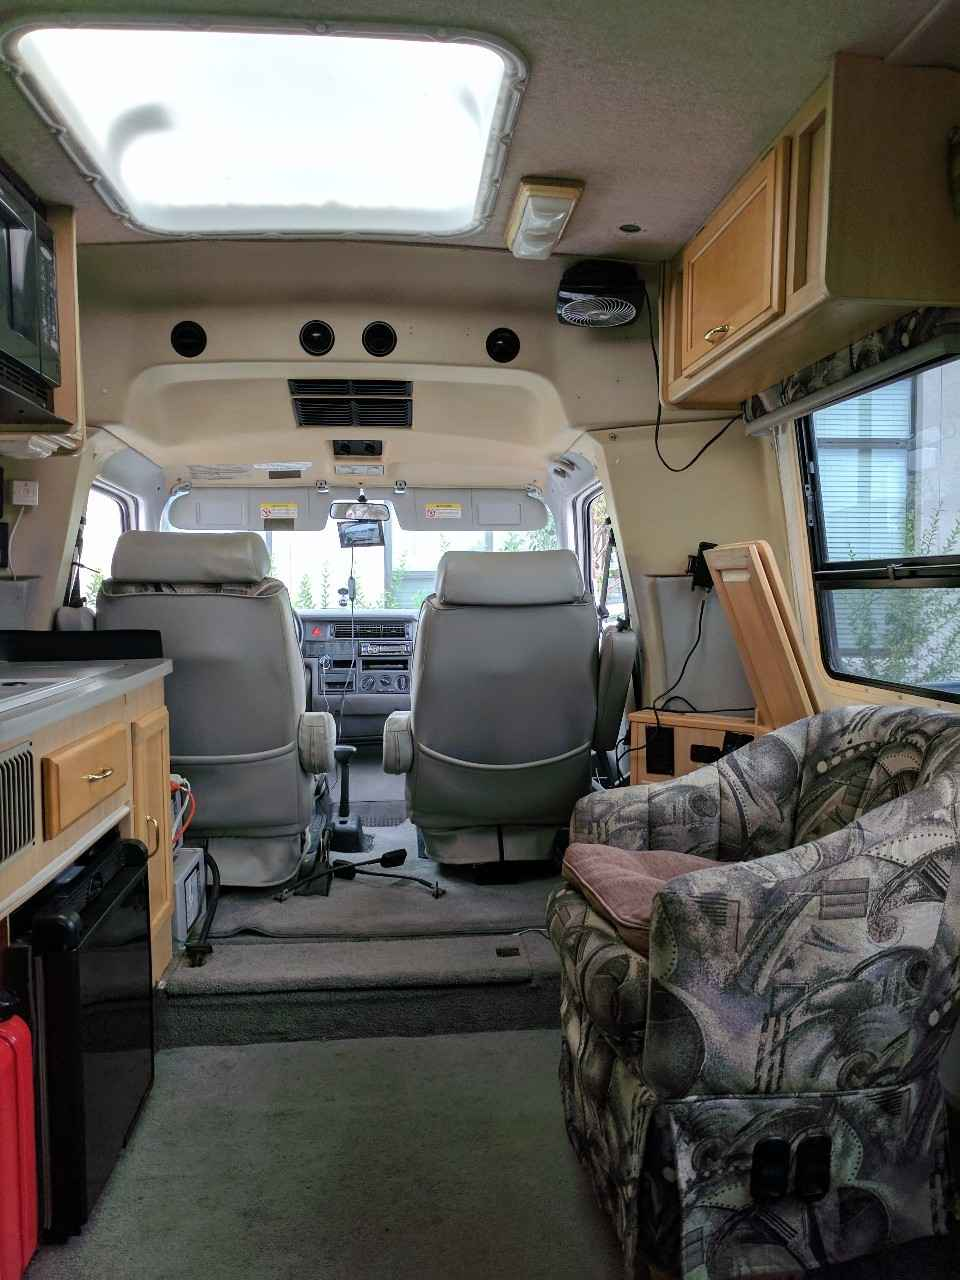 1999 Used Winnebago Eurovan Camper RIALTA RIALTA Class B in